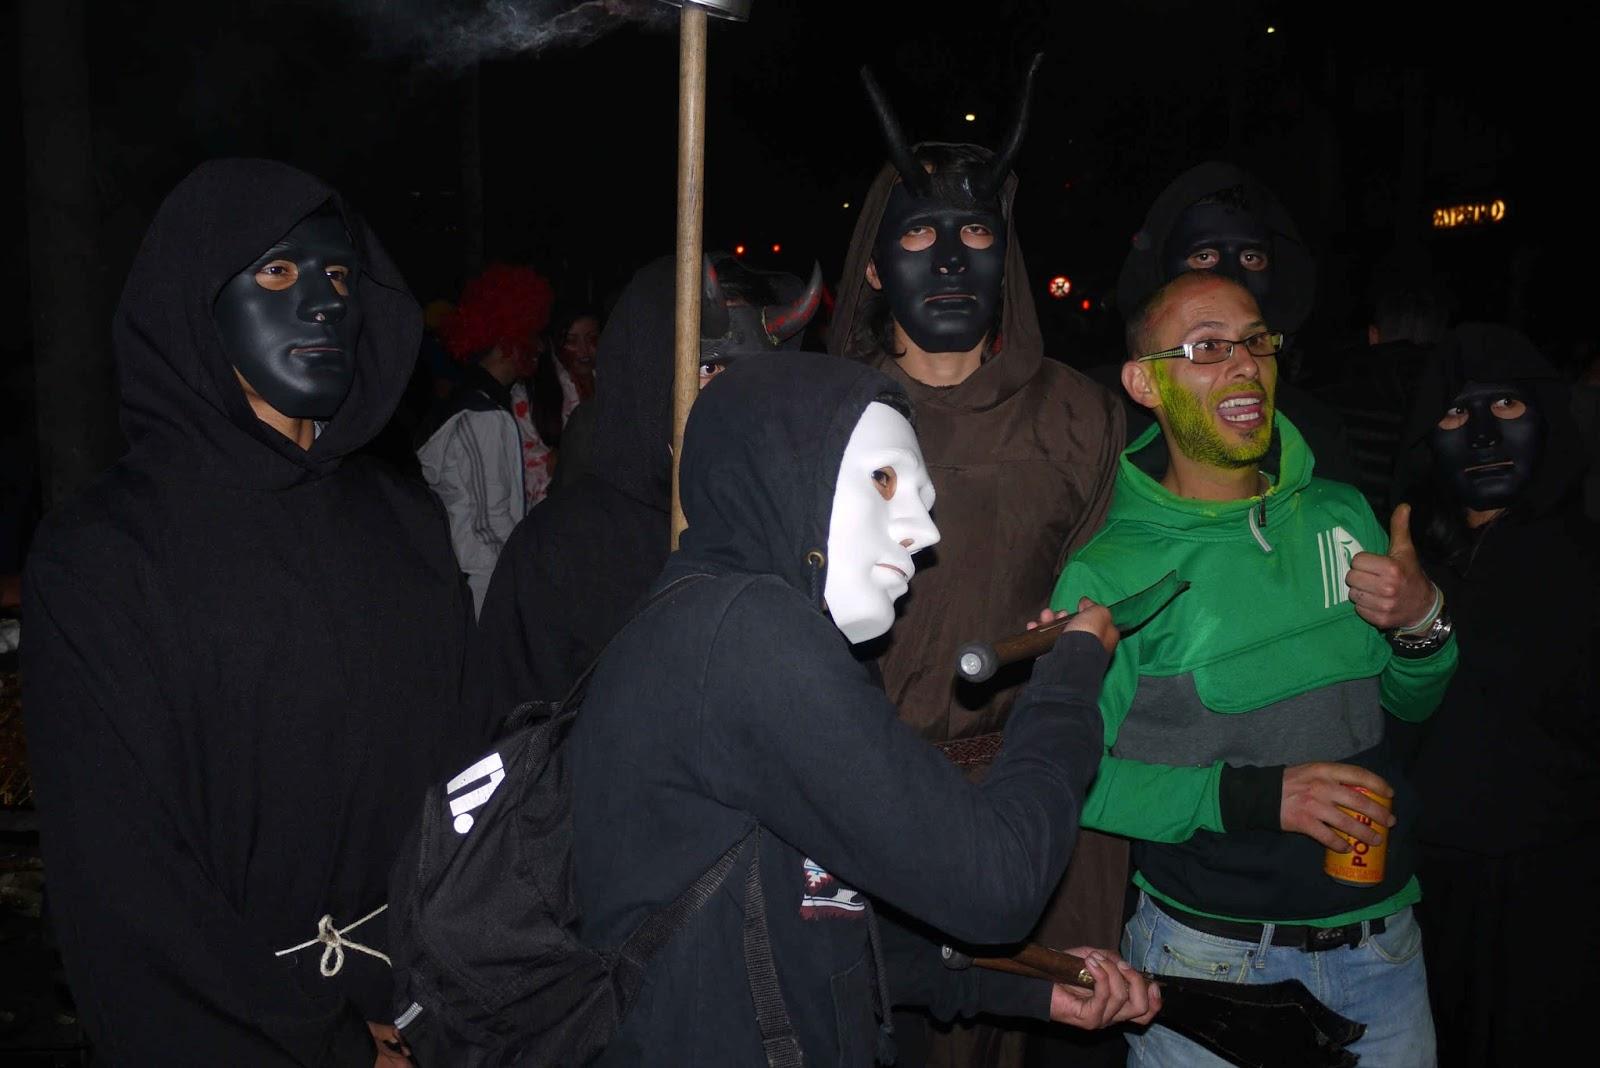 Mike's Bogota Blog: Halloween on La Septima